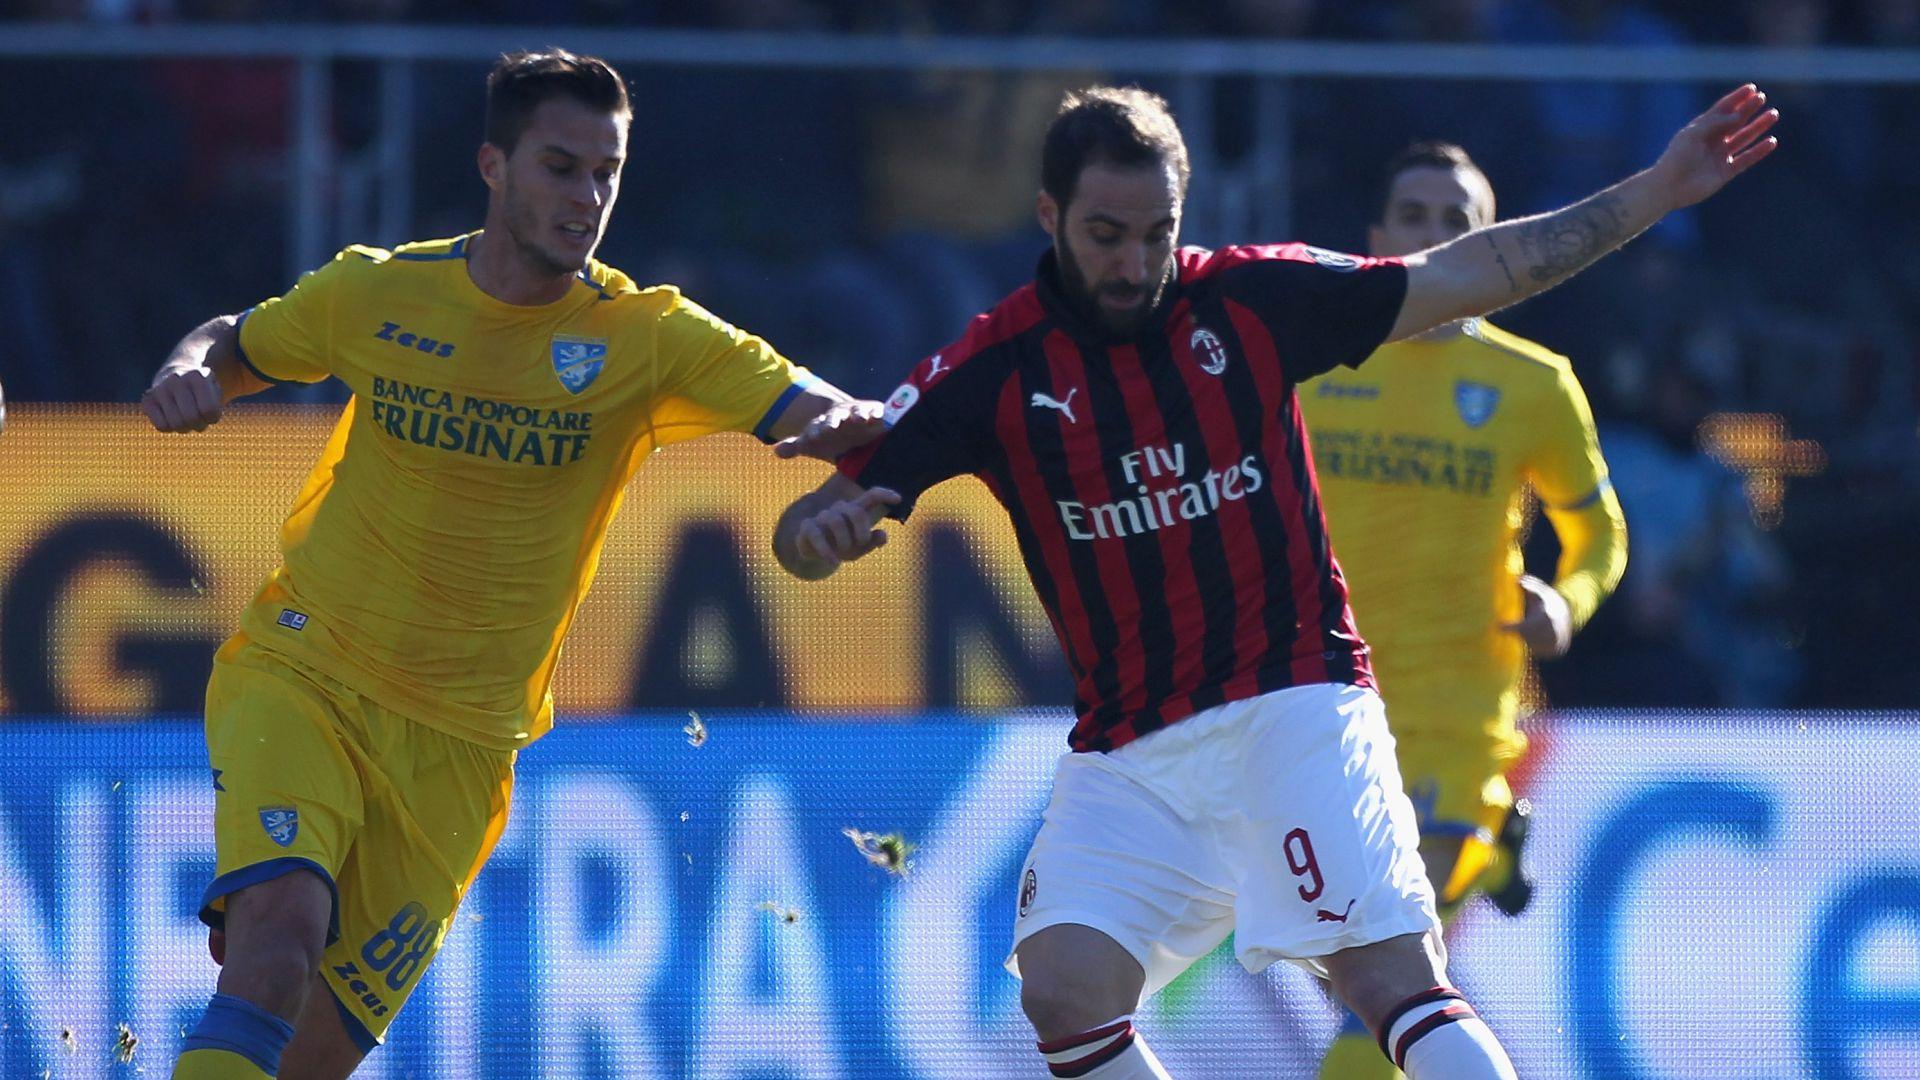 Gonzalo Higuain Frosinone Milan Serie A